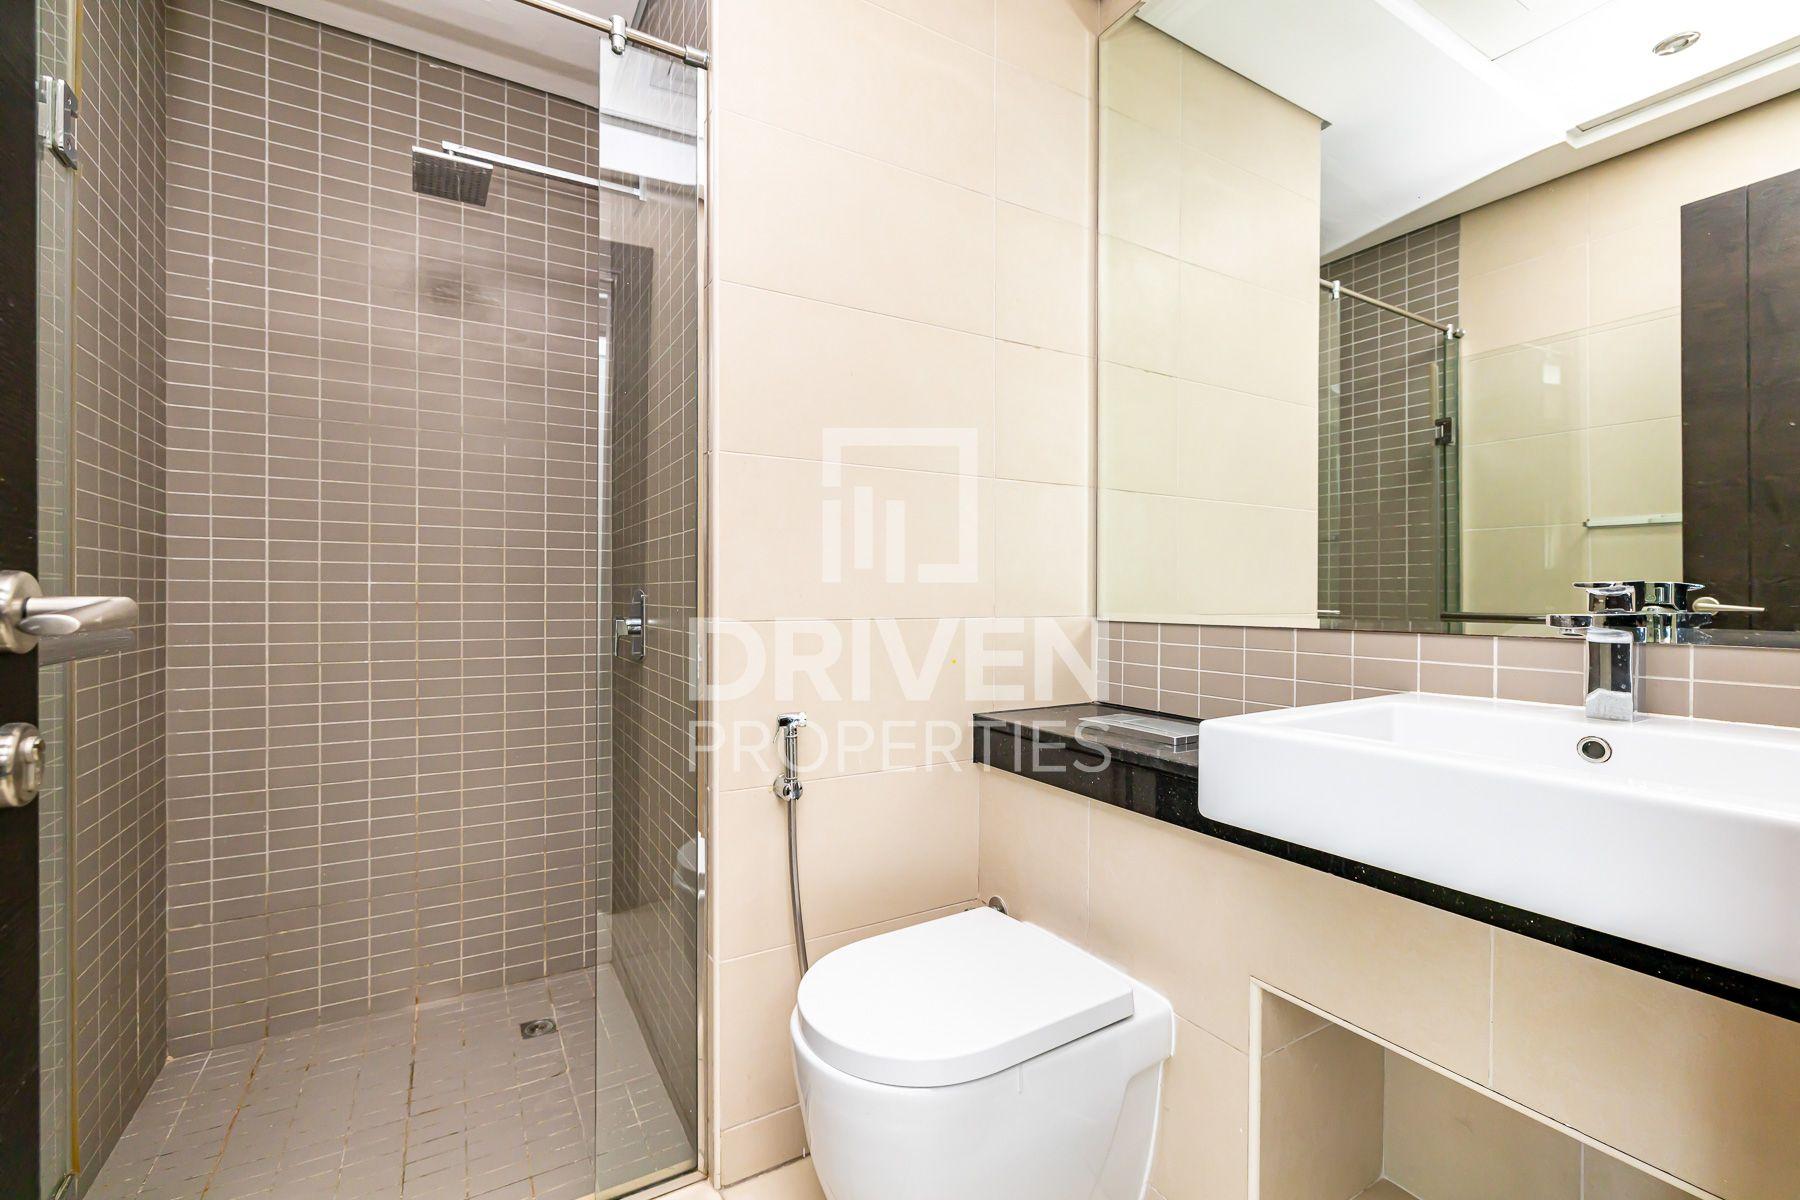 Apartment for Rent in Silverene Tower B - Dubai Marina